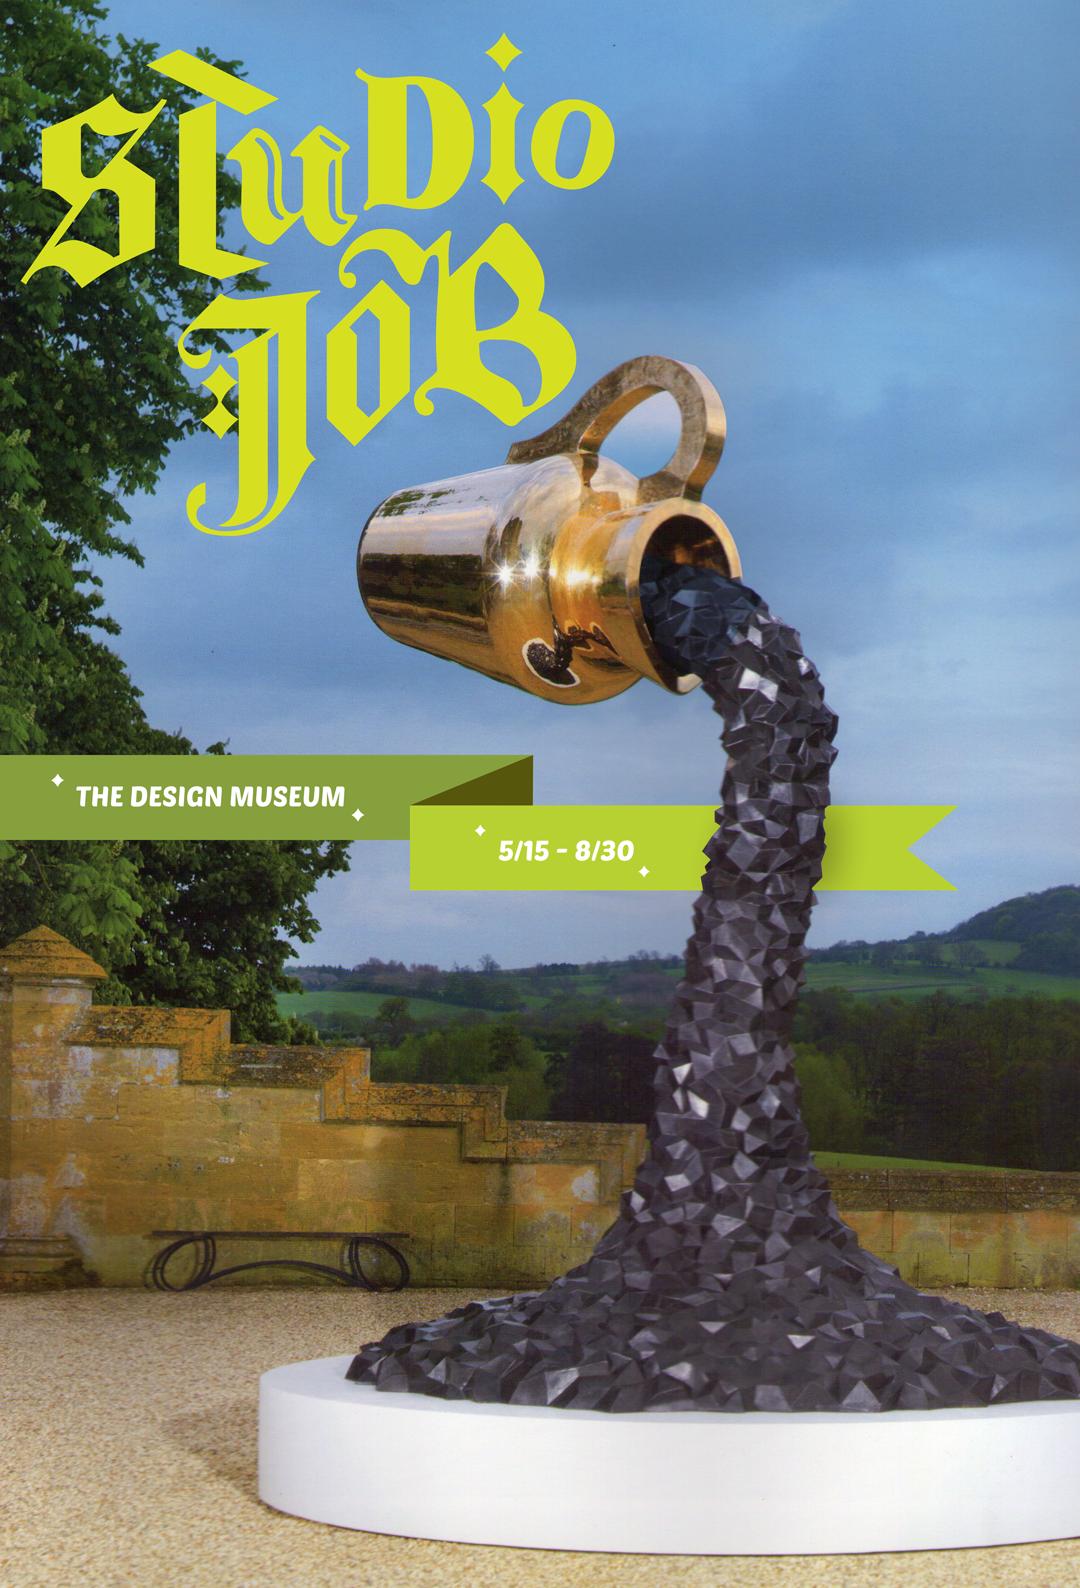 StudioJob_Posters(2).png